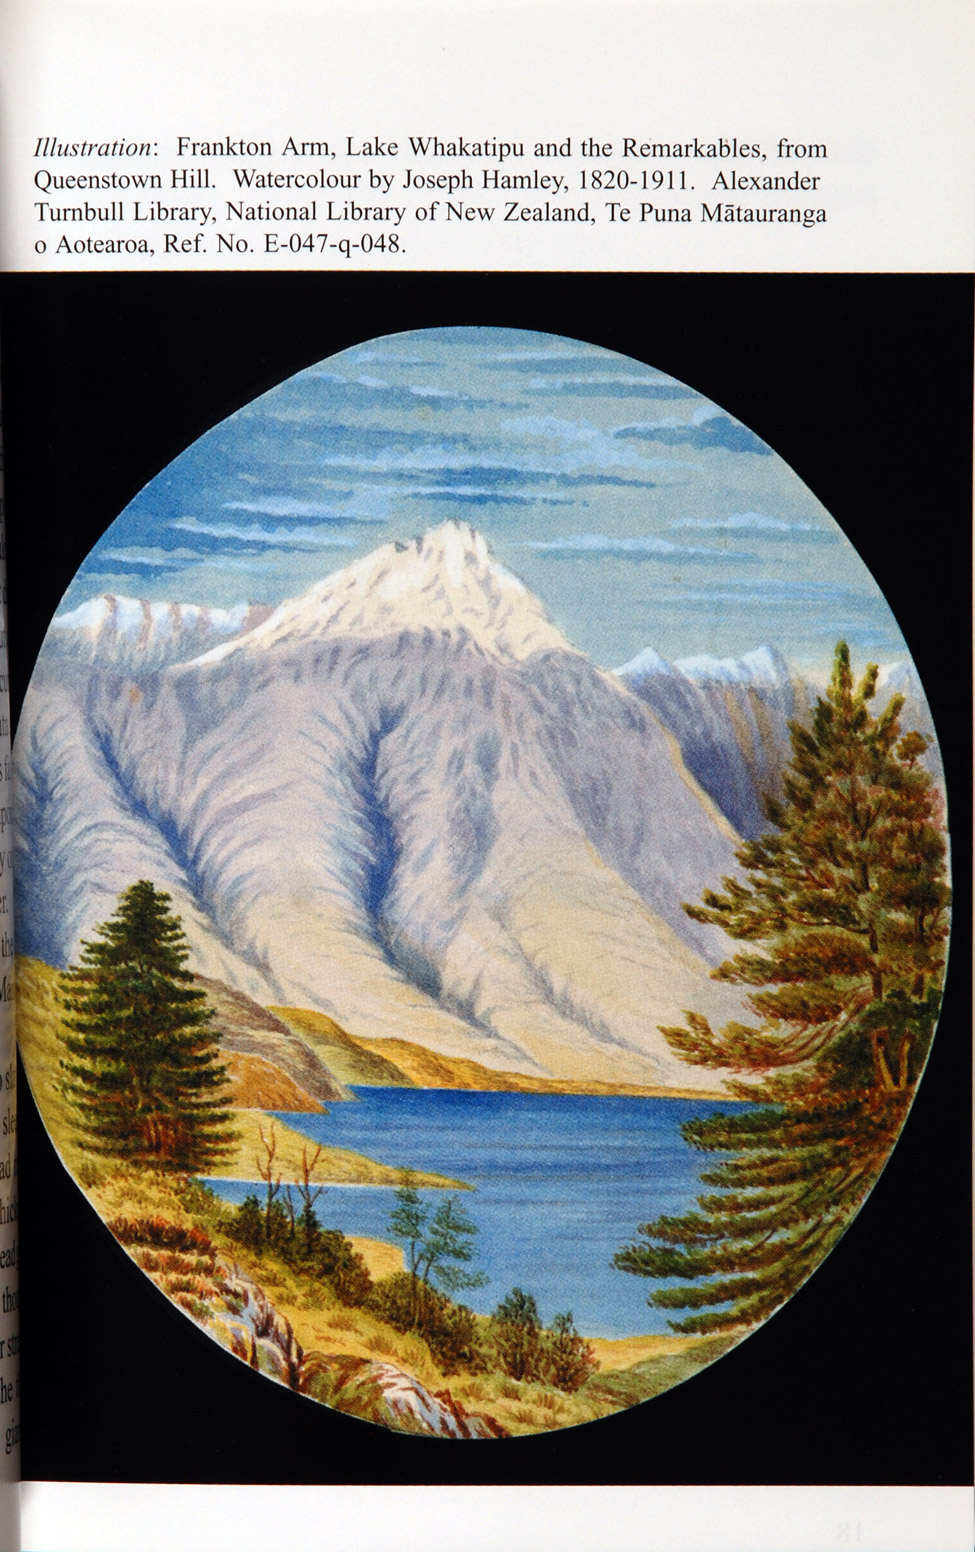 Murdoch Riley. <i>Māori Love Legends … and True Stories. </i> Paraparaumu: Viking Sevenseas NZ Ltd., 2003.